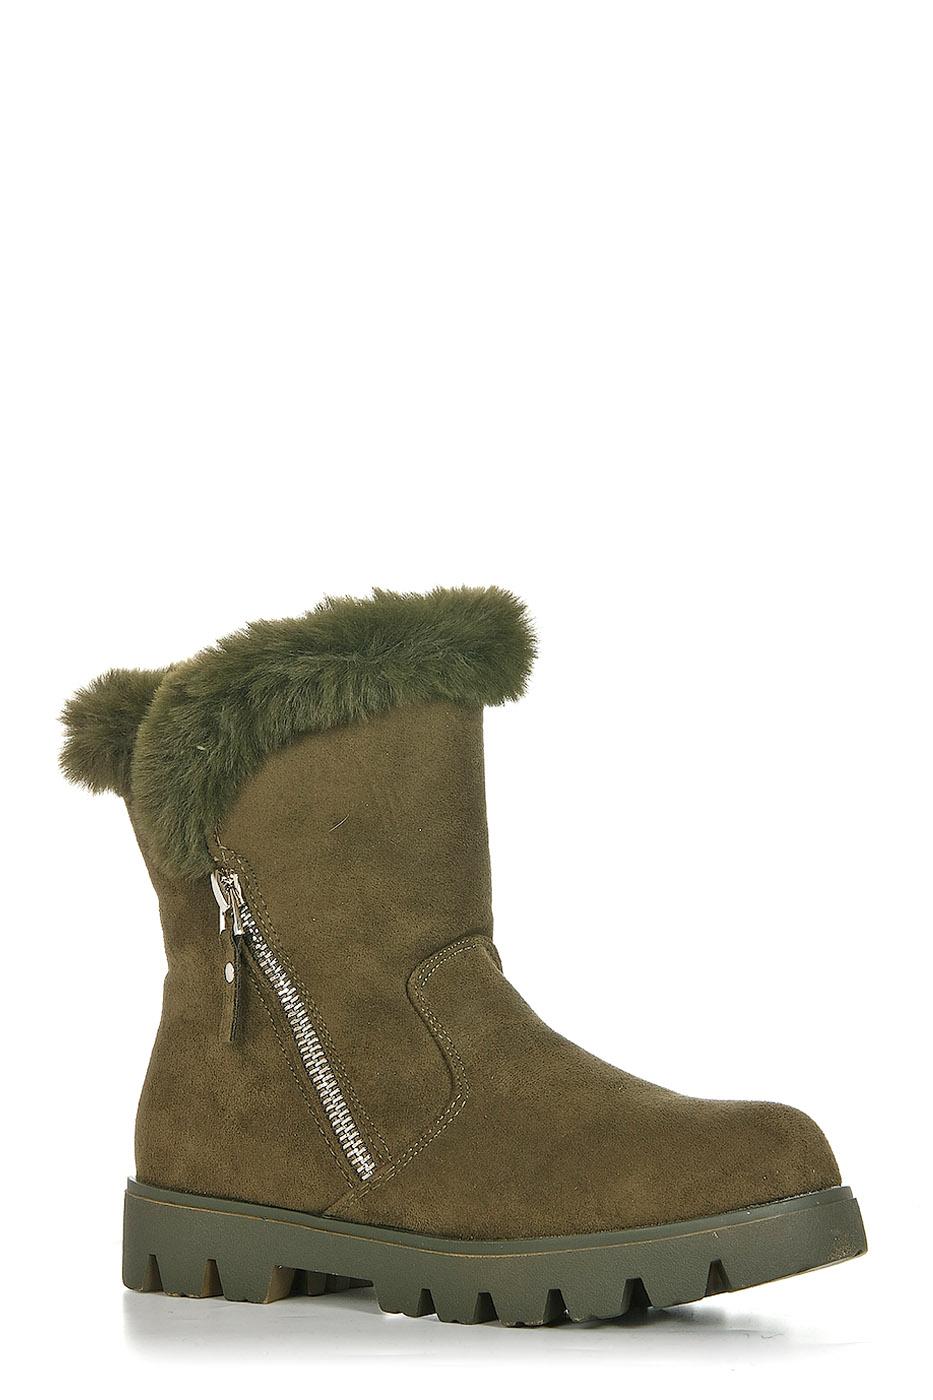 Ботинки TOPLAND2352-PB76160X/GREEN